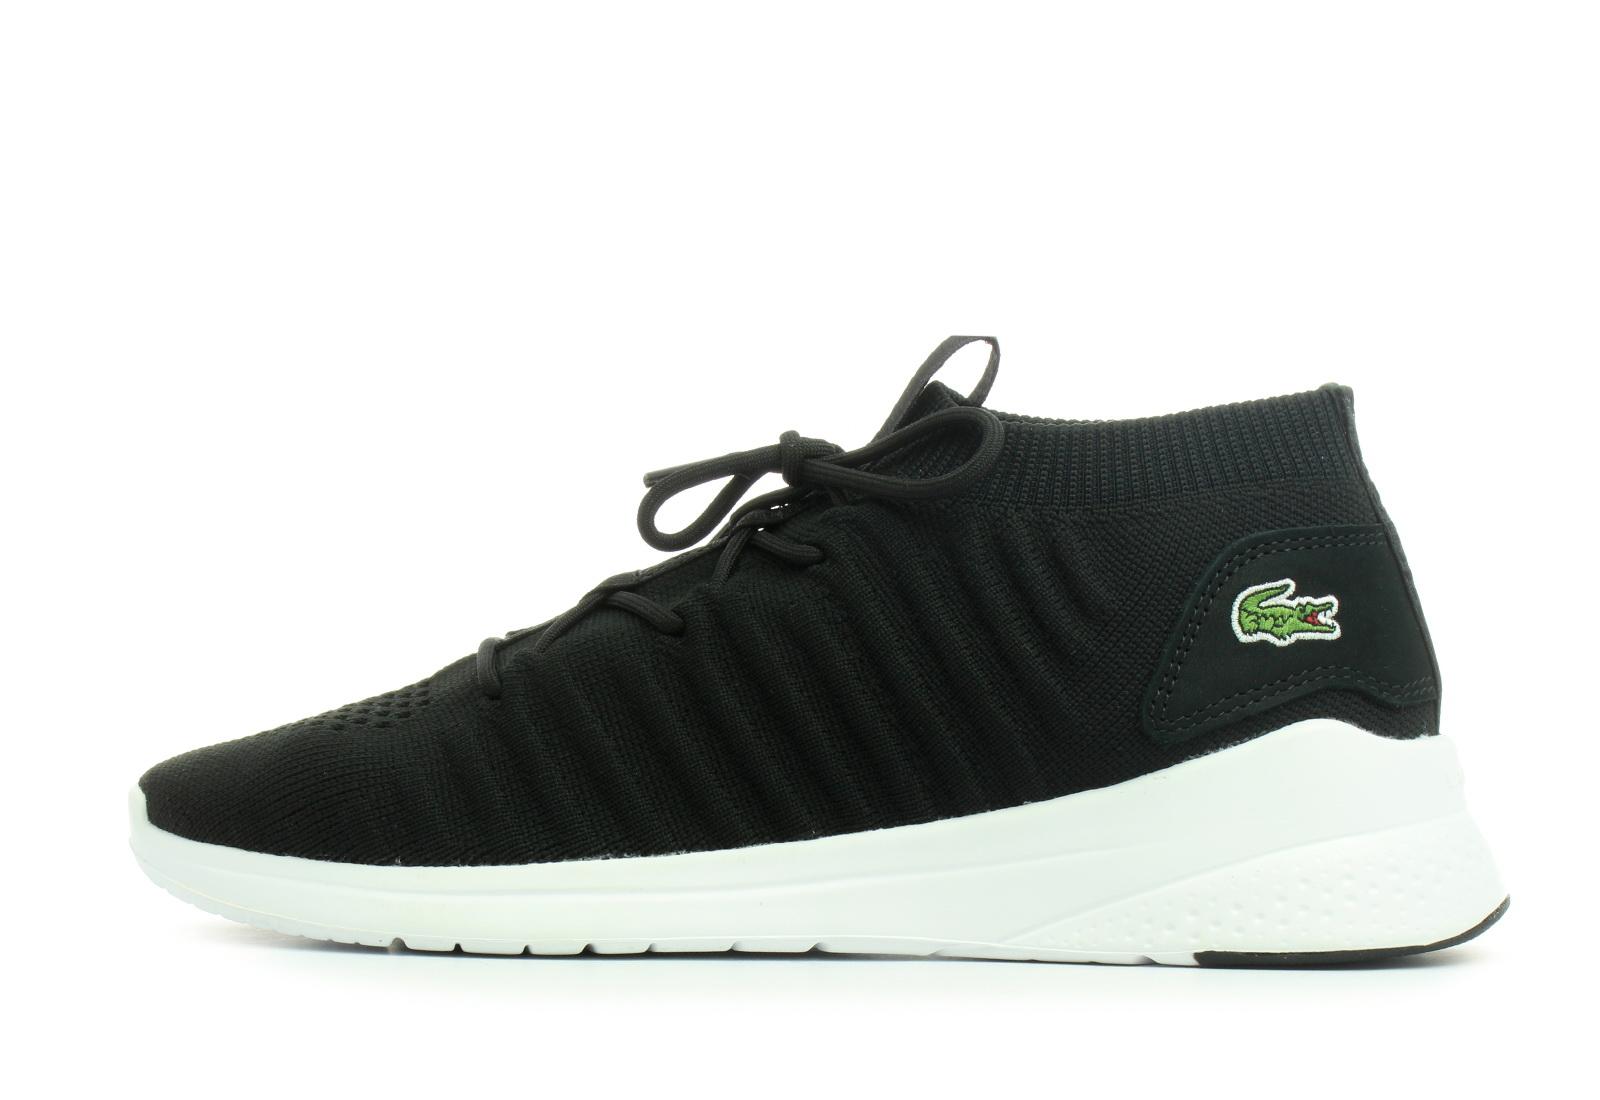 uusi korkea vakaa laatu verkkosivusto alennus Lacoste Shoes - Lt Fit - Flex 319 1 - 193SFA0031-312 - Online shop for  sneakers, shoes and boots